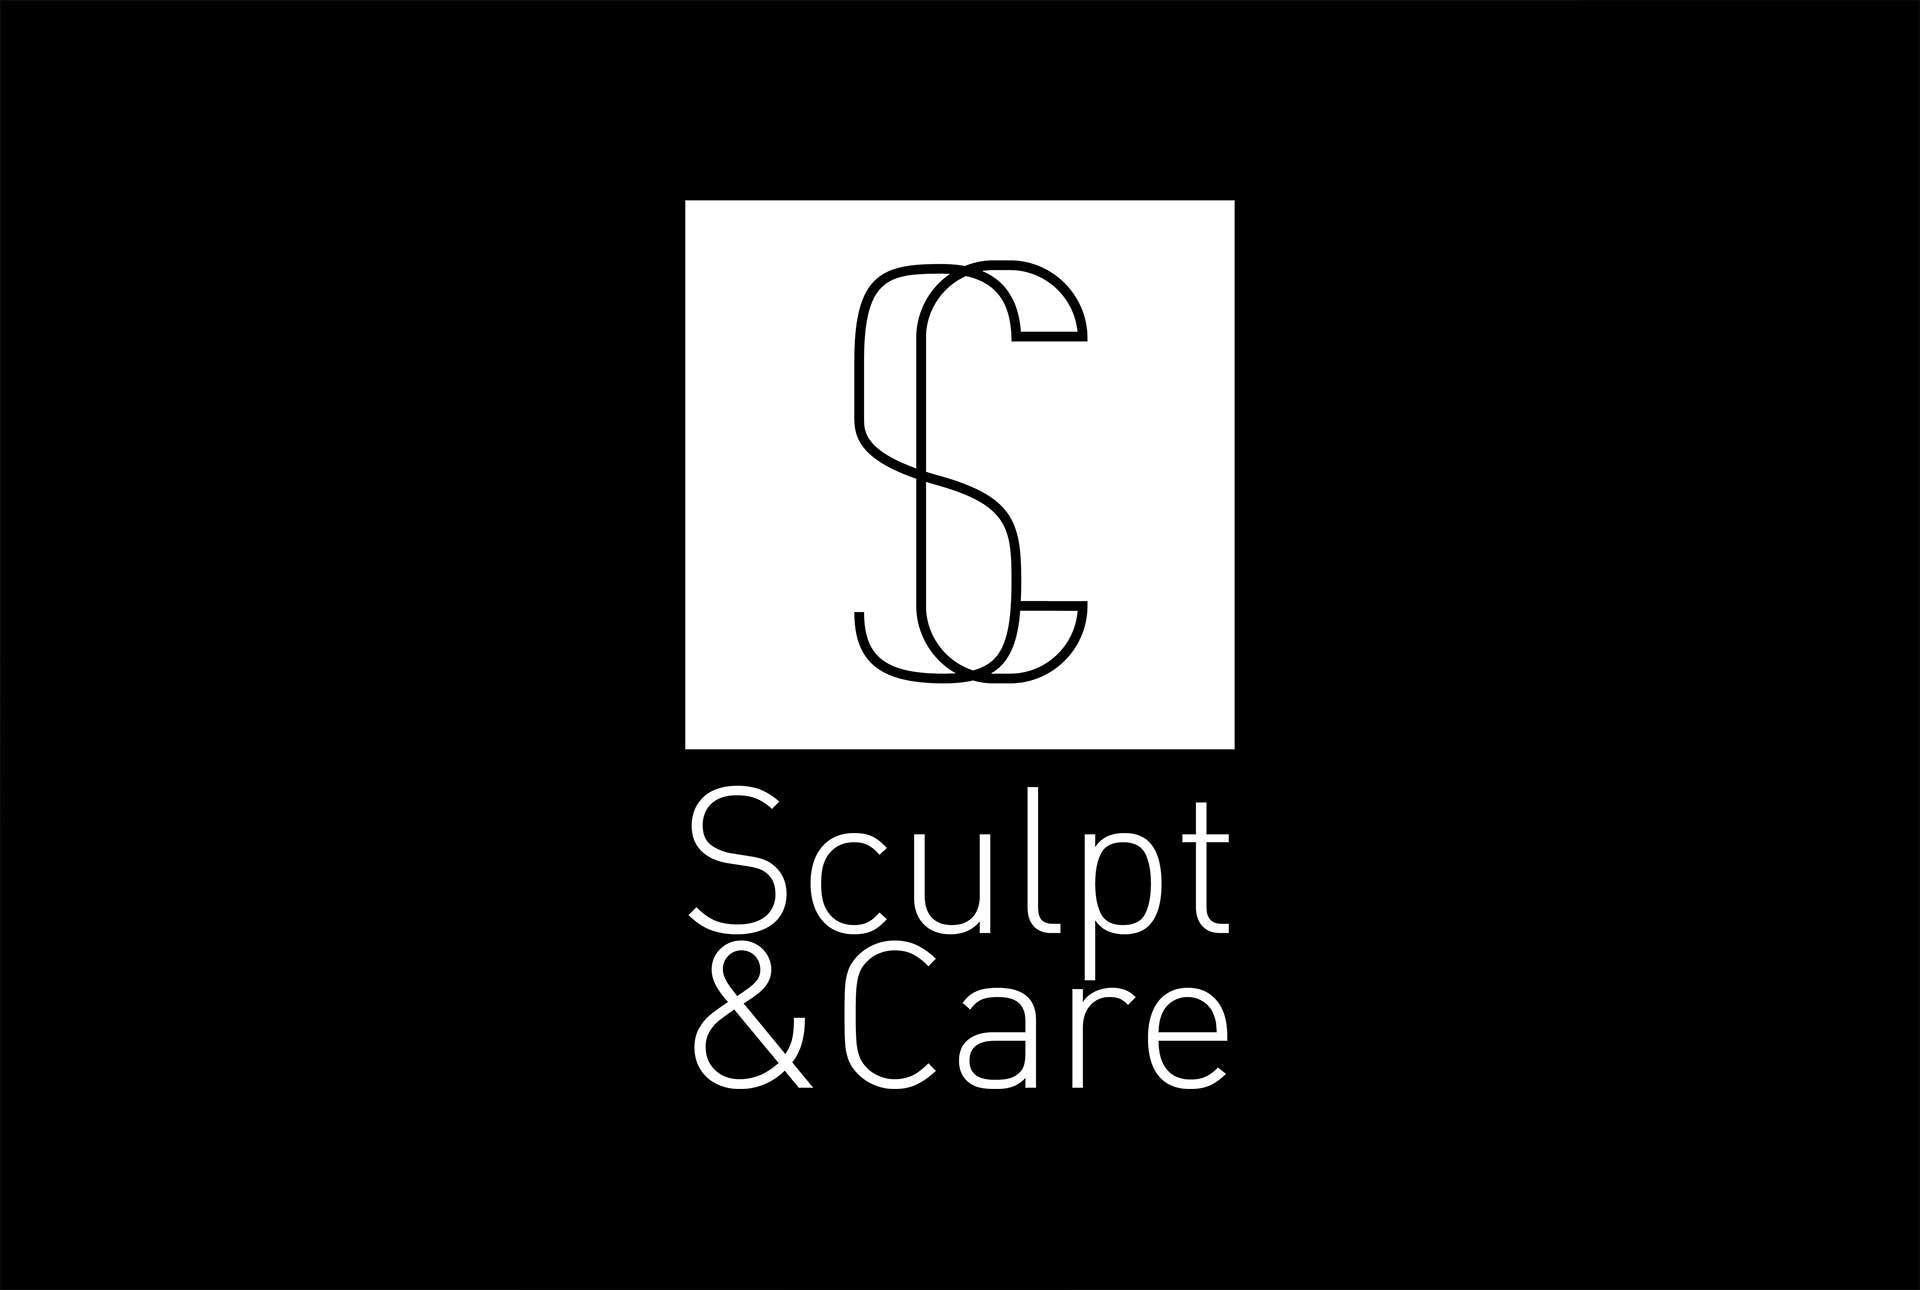 sculpt care creation logo sport fitness graphiste grenoble